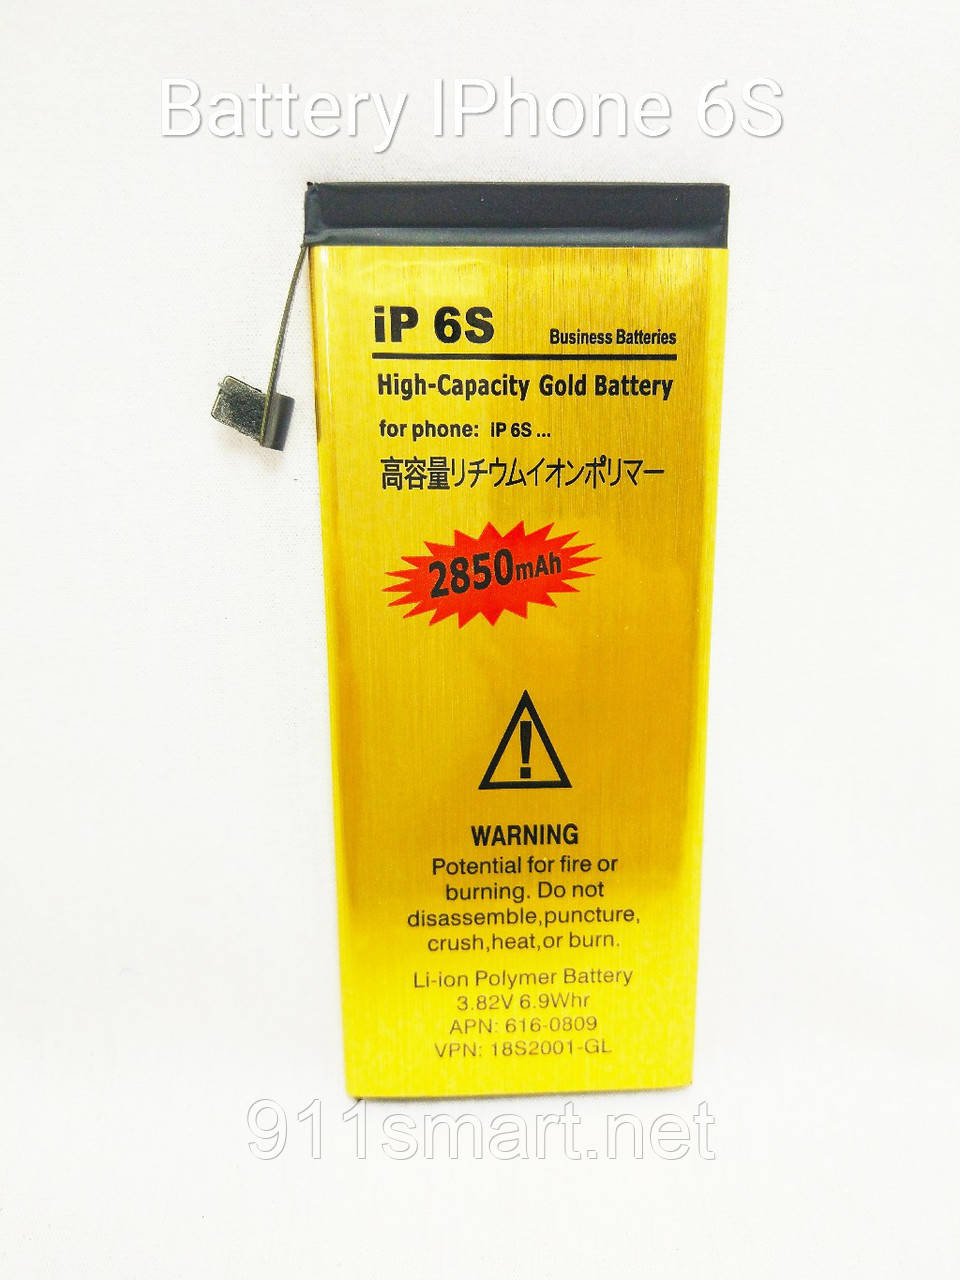 Усиленный аккумулятор Iphone 6S APN 616-0809